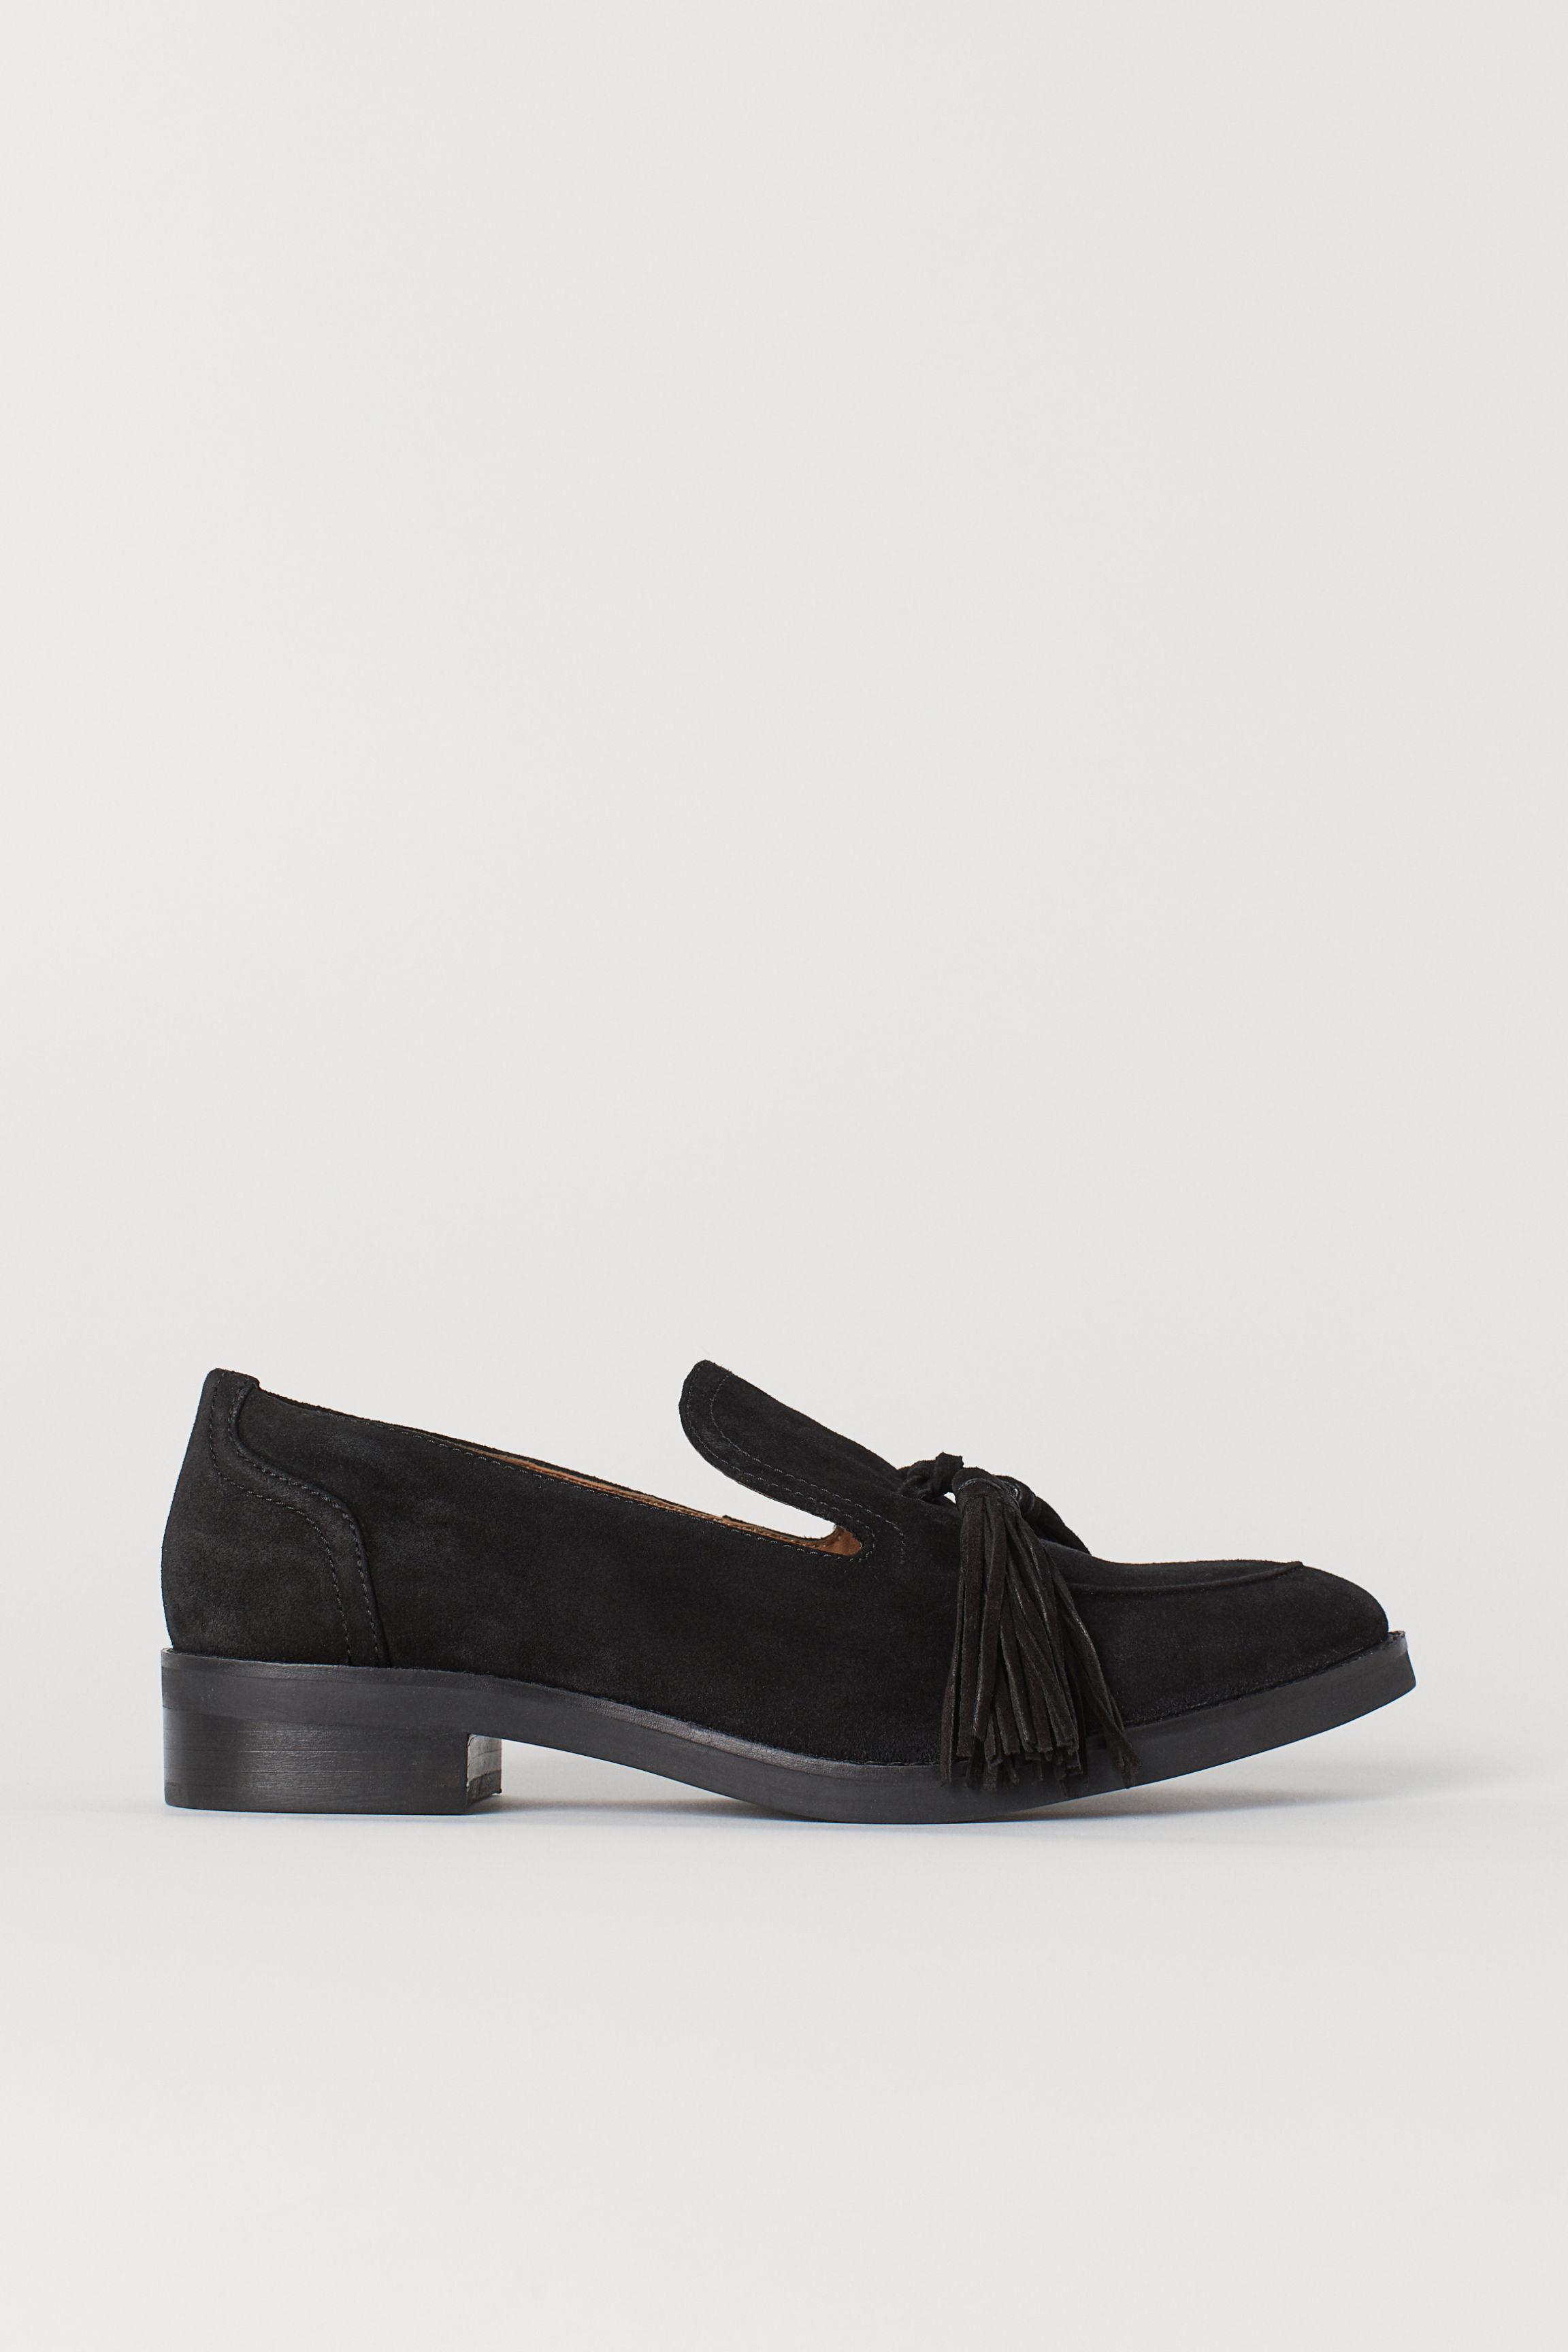 ce137b3780730 Tasseled Loafers